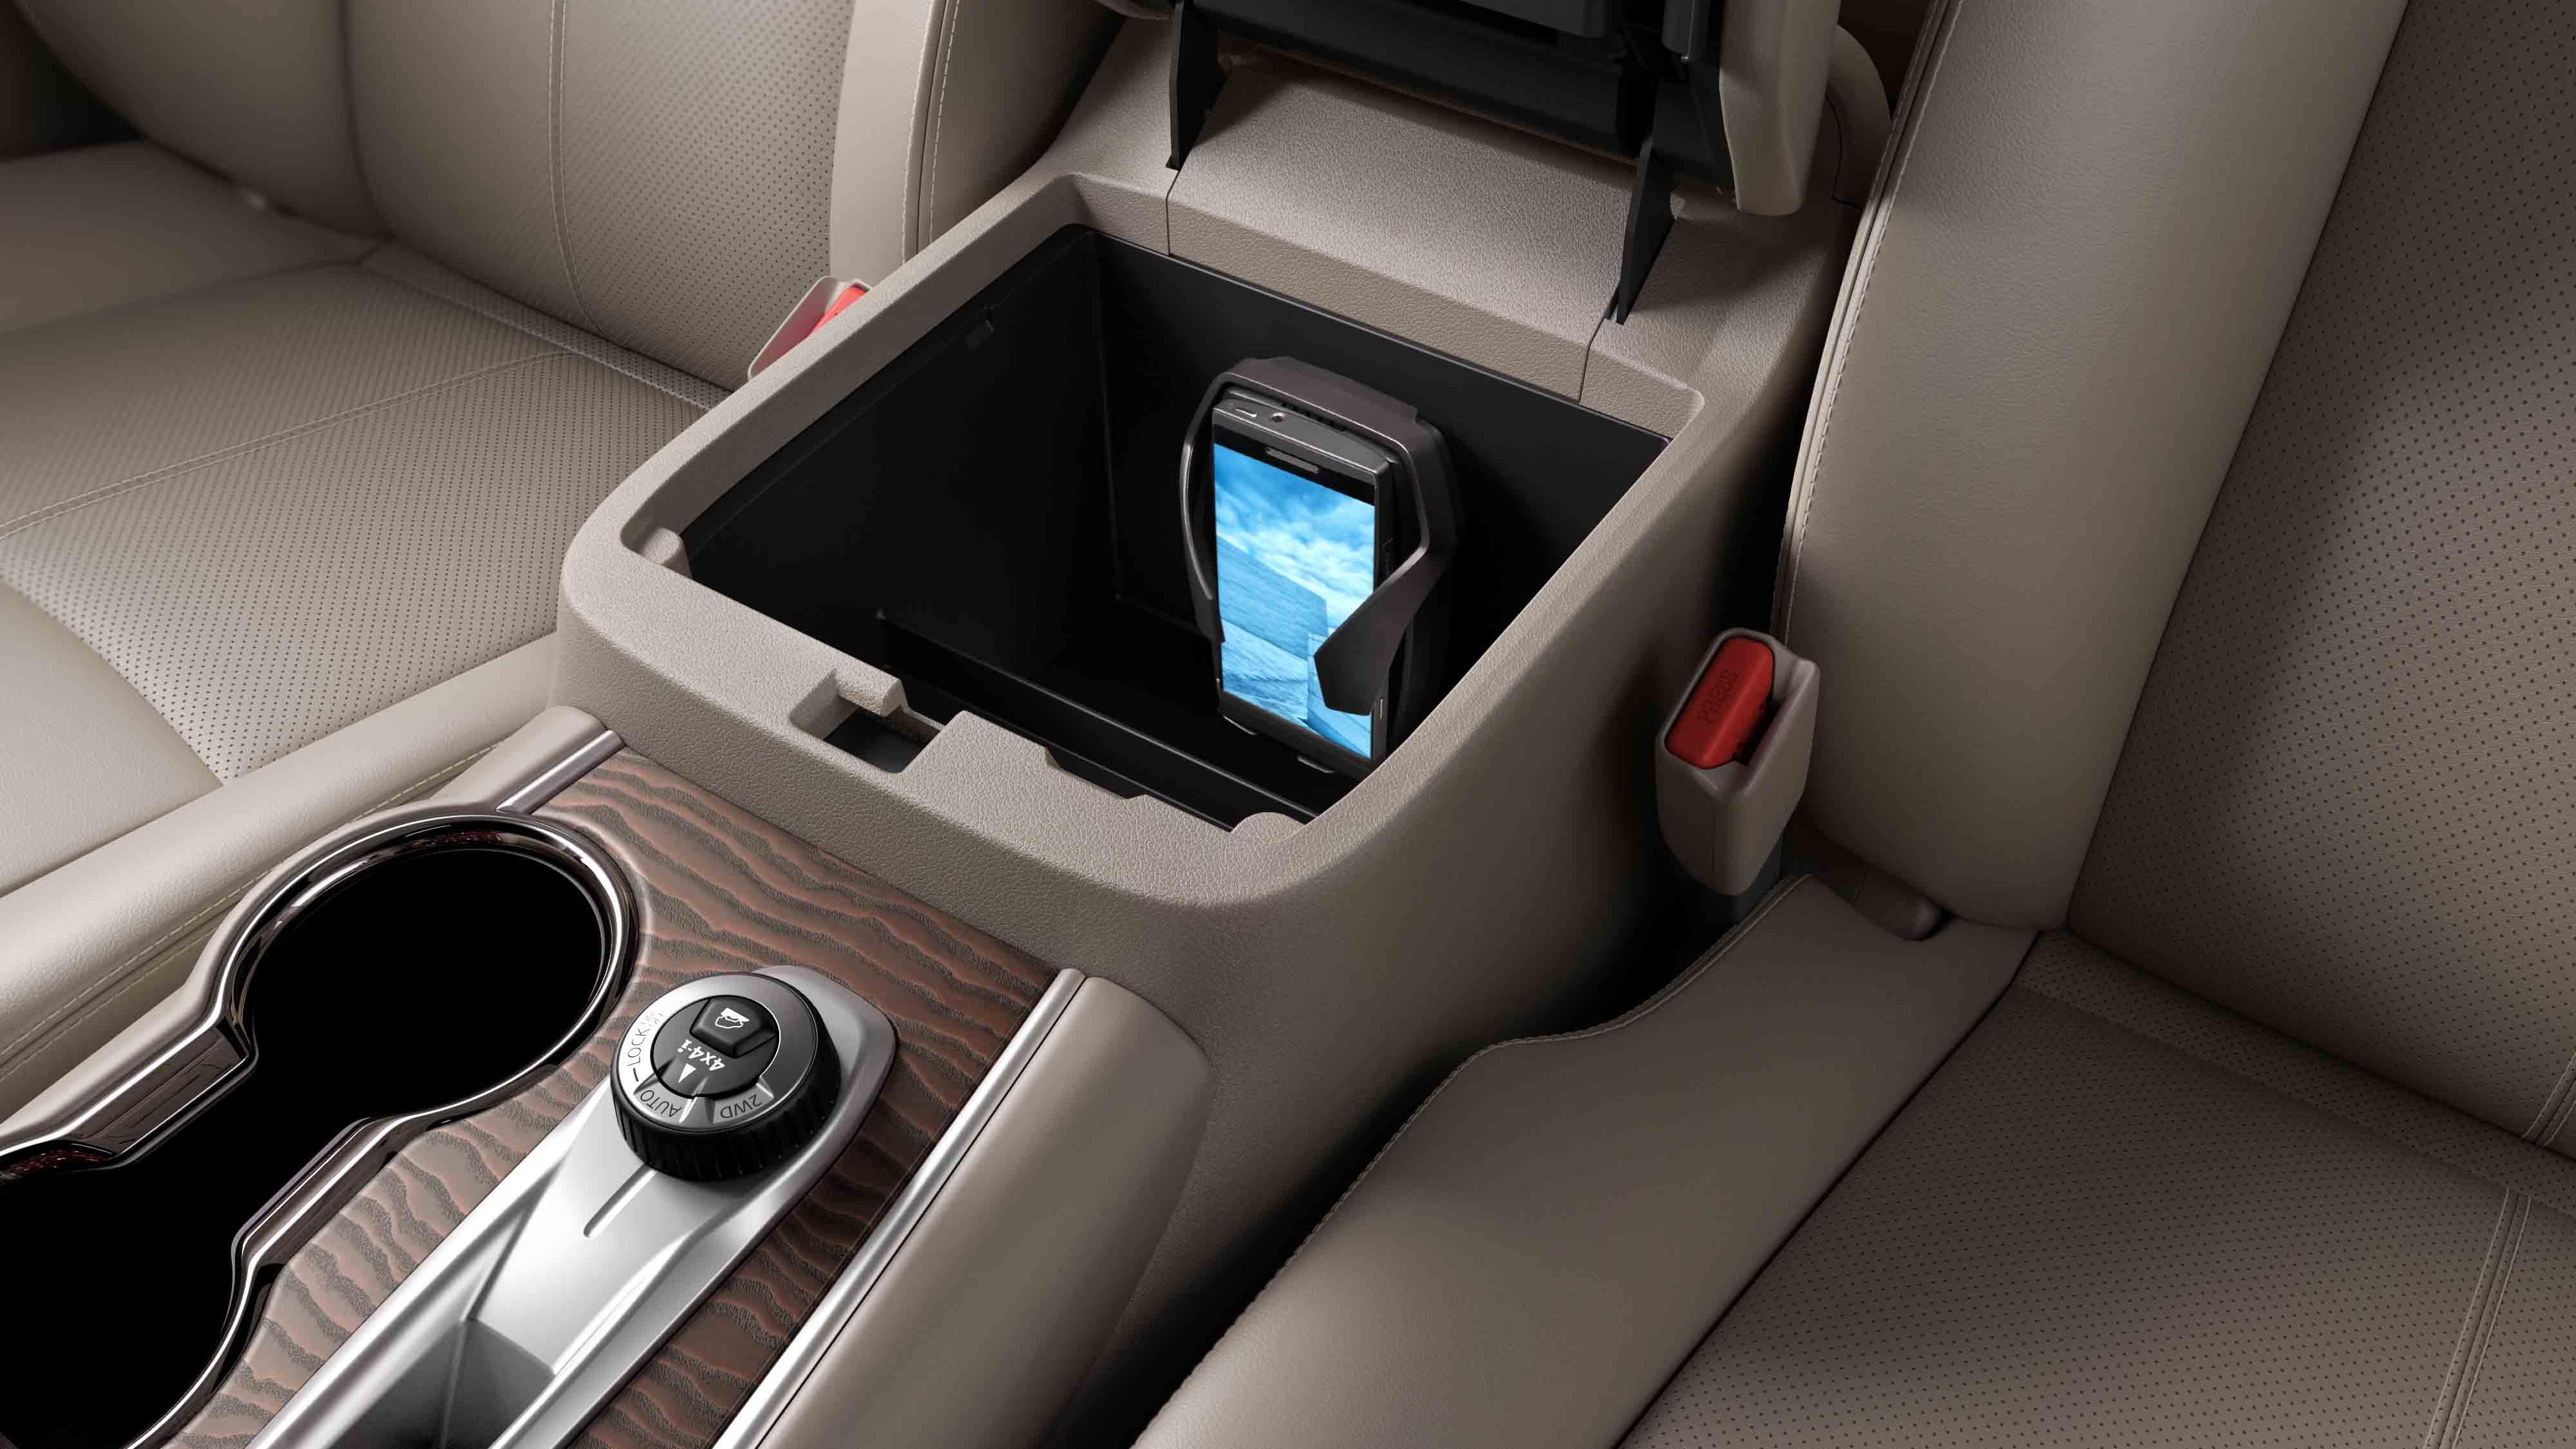 2019 Nissan Pathfinder Review Selma CA| Selma Nissan